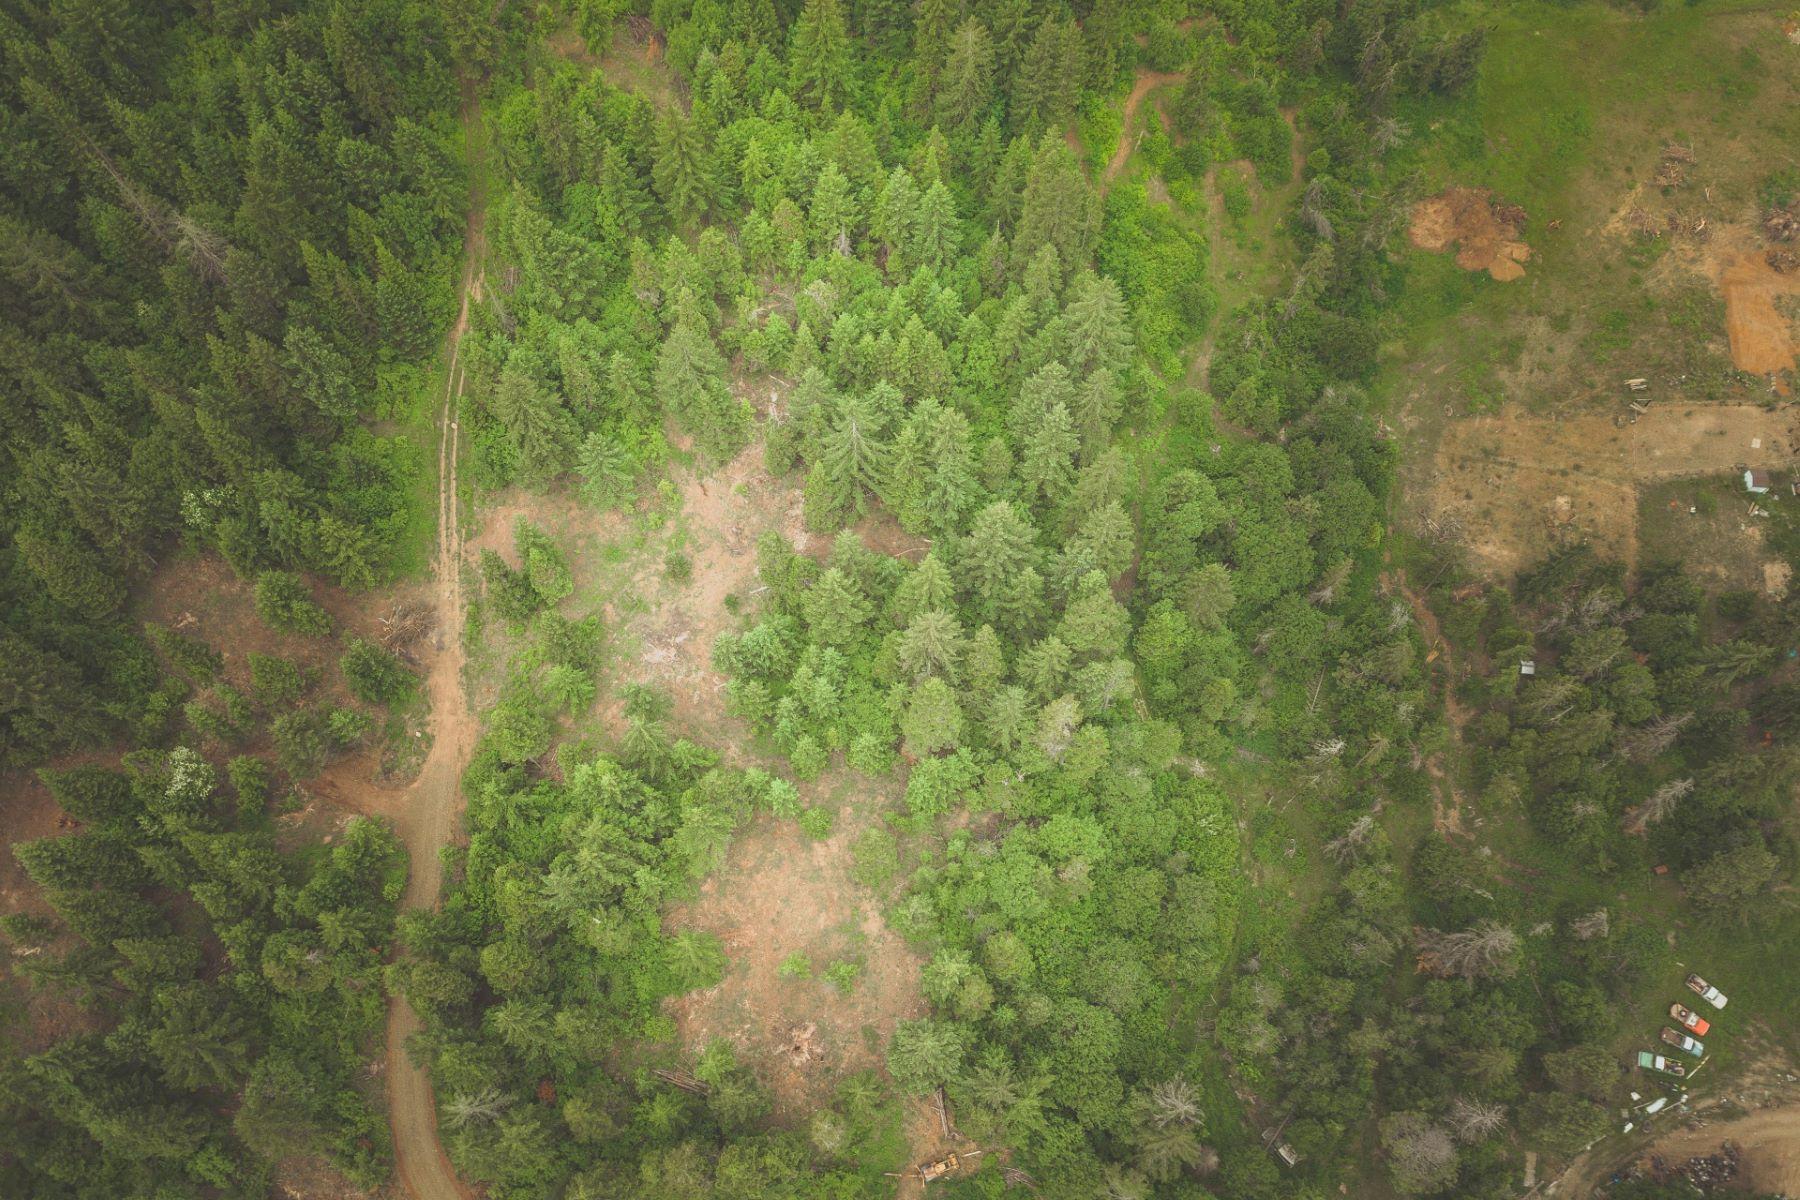 Land for Sale at Lot 400 Kida Road White Salmon, Washington 98672 United States